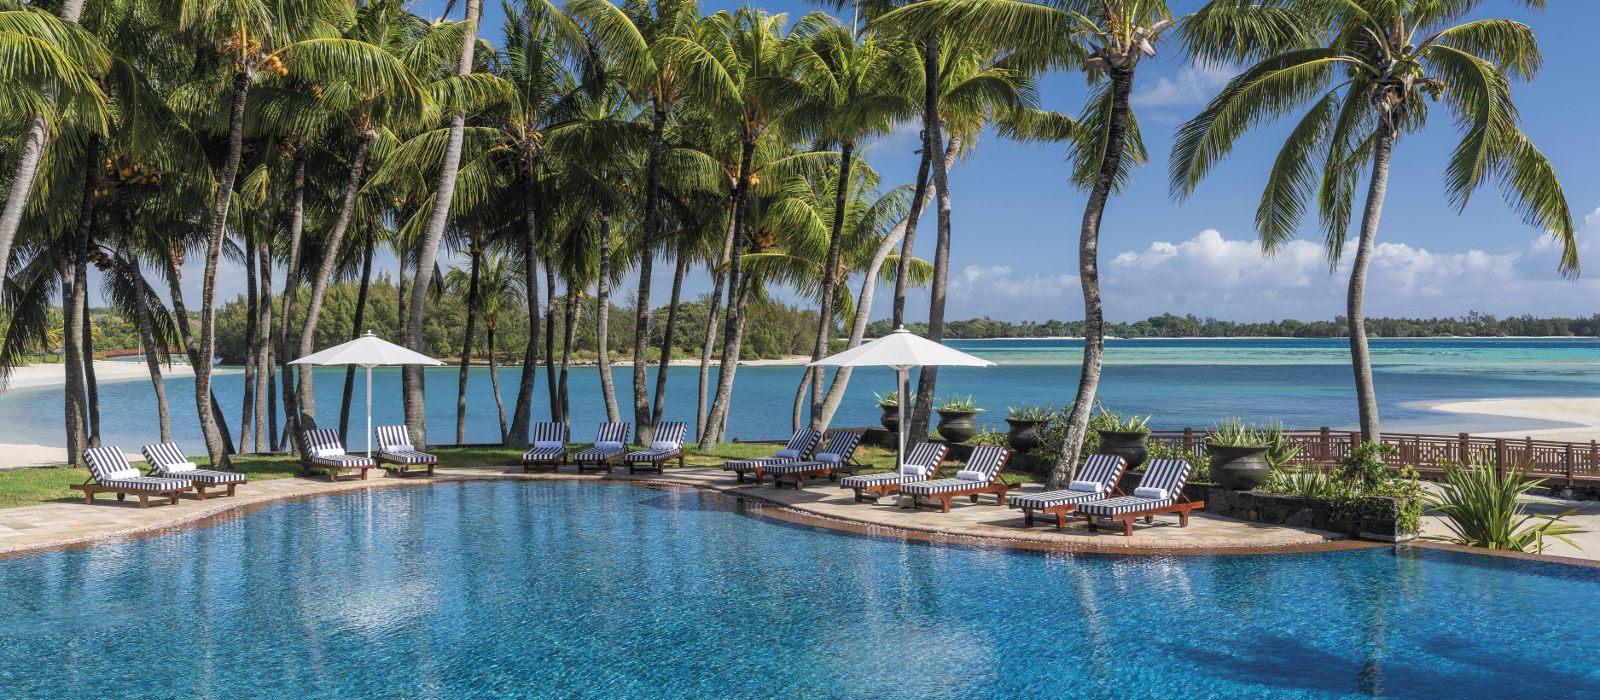 Hotel Shangri-La's Le Touessrok Resort & Spa Mauritius